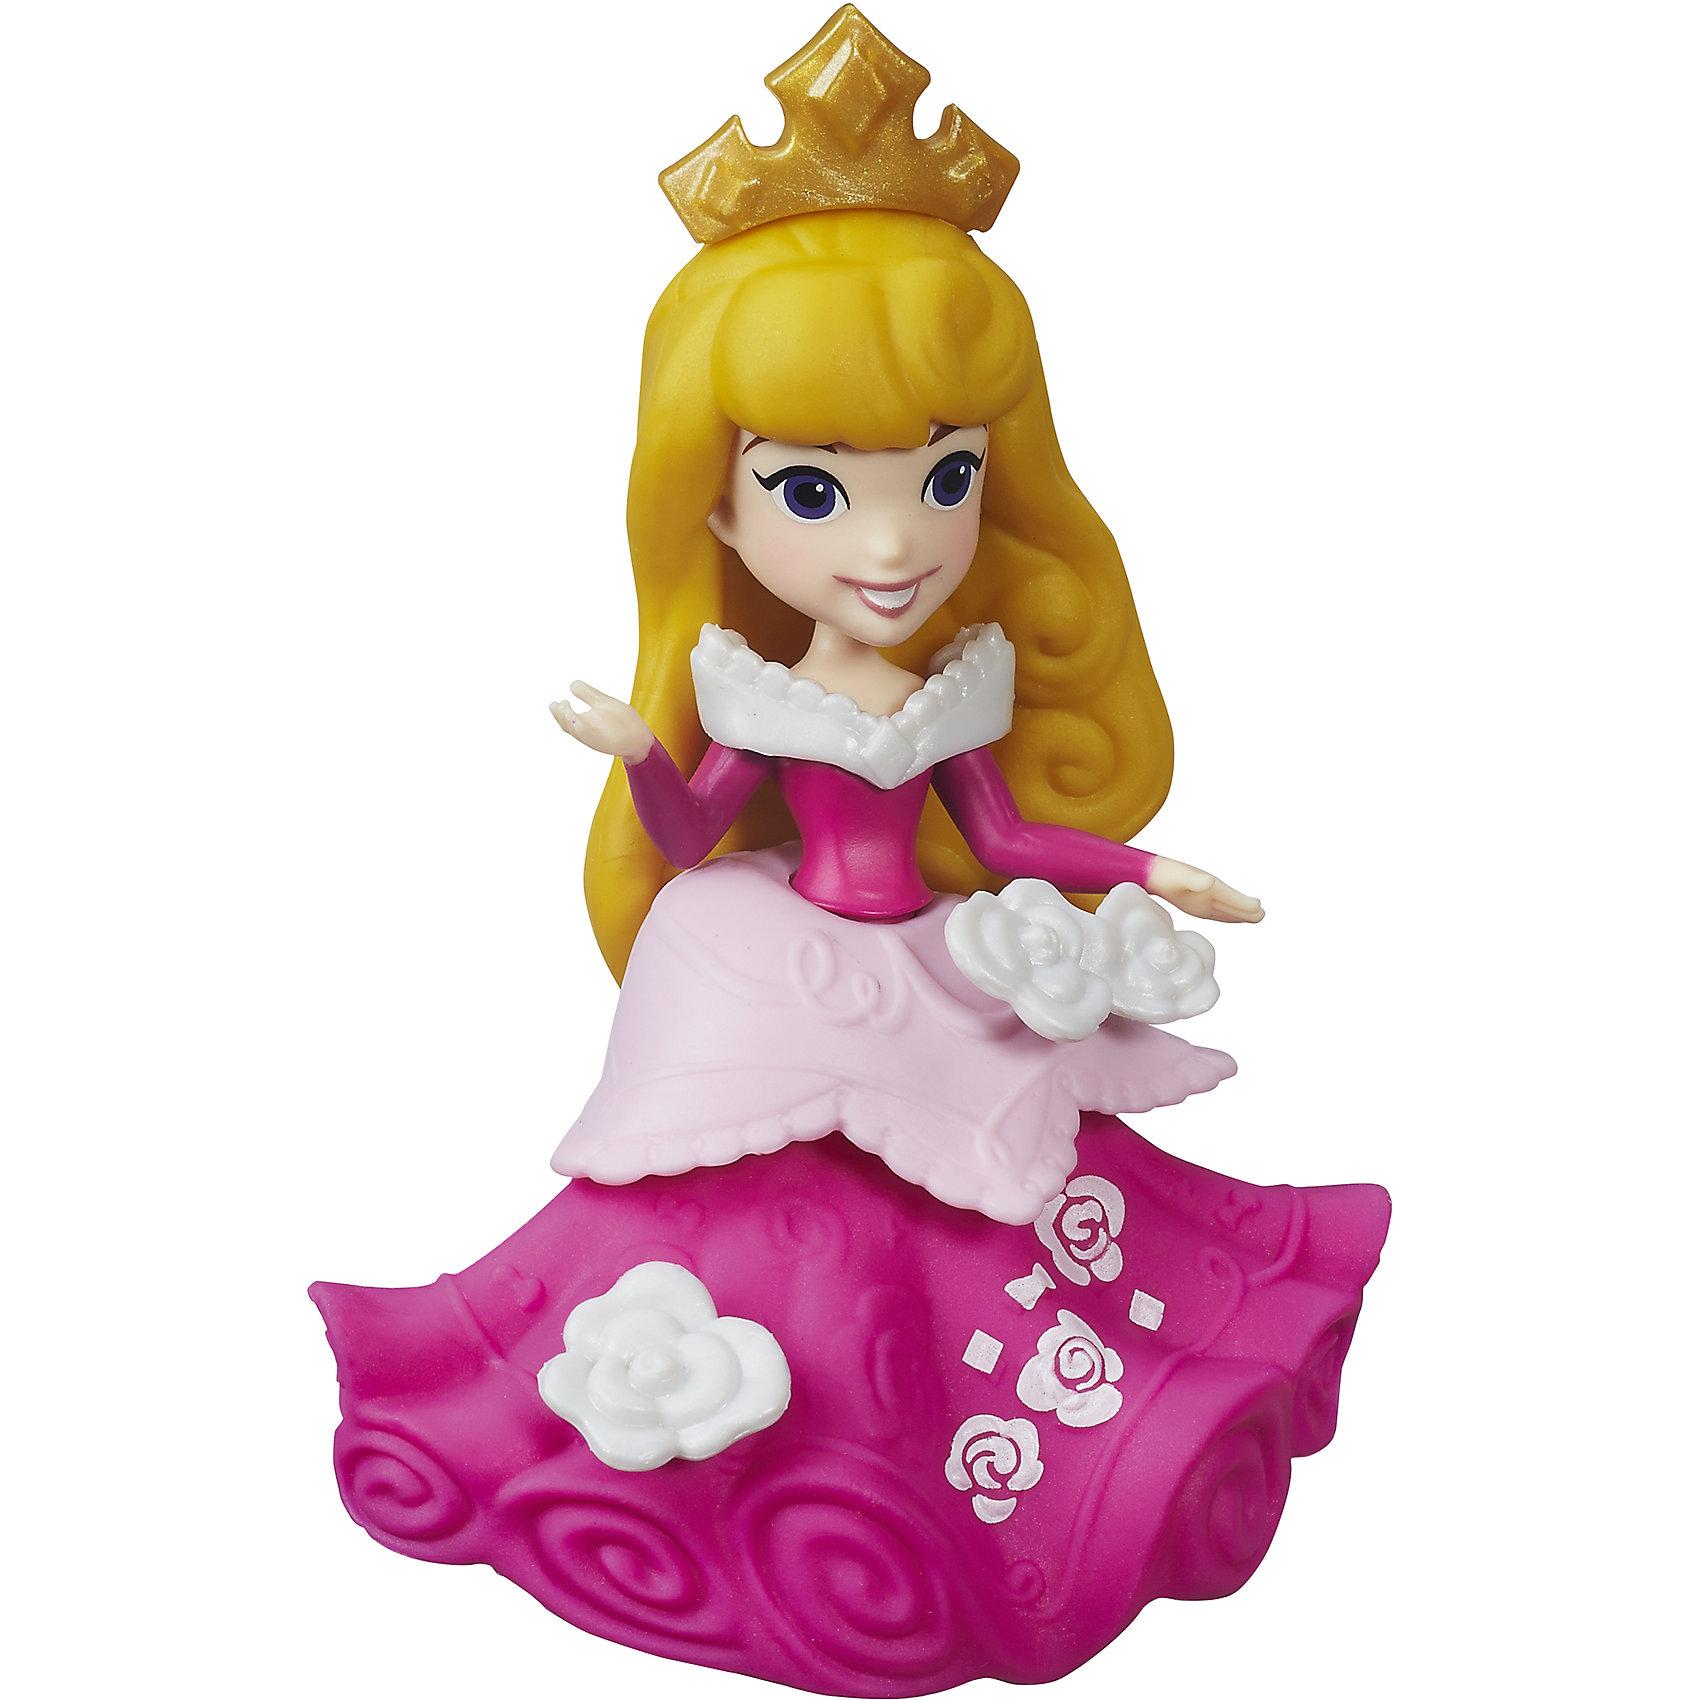 Hasbro Мини-кукла, Принцессы Дисней hasbro кукла принцесса аврора принцессы дисней